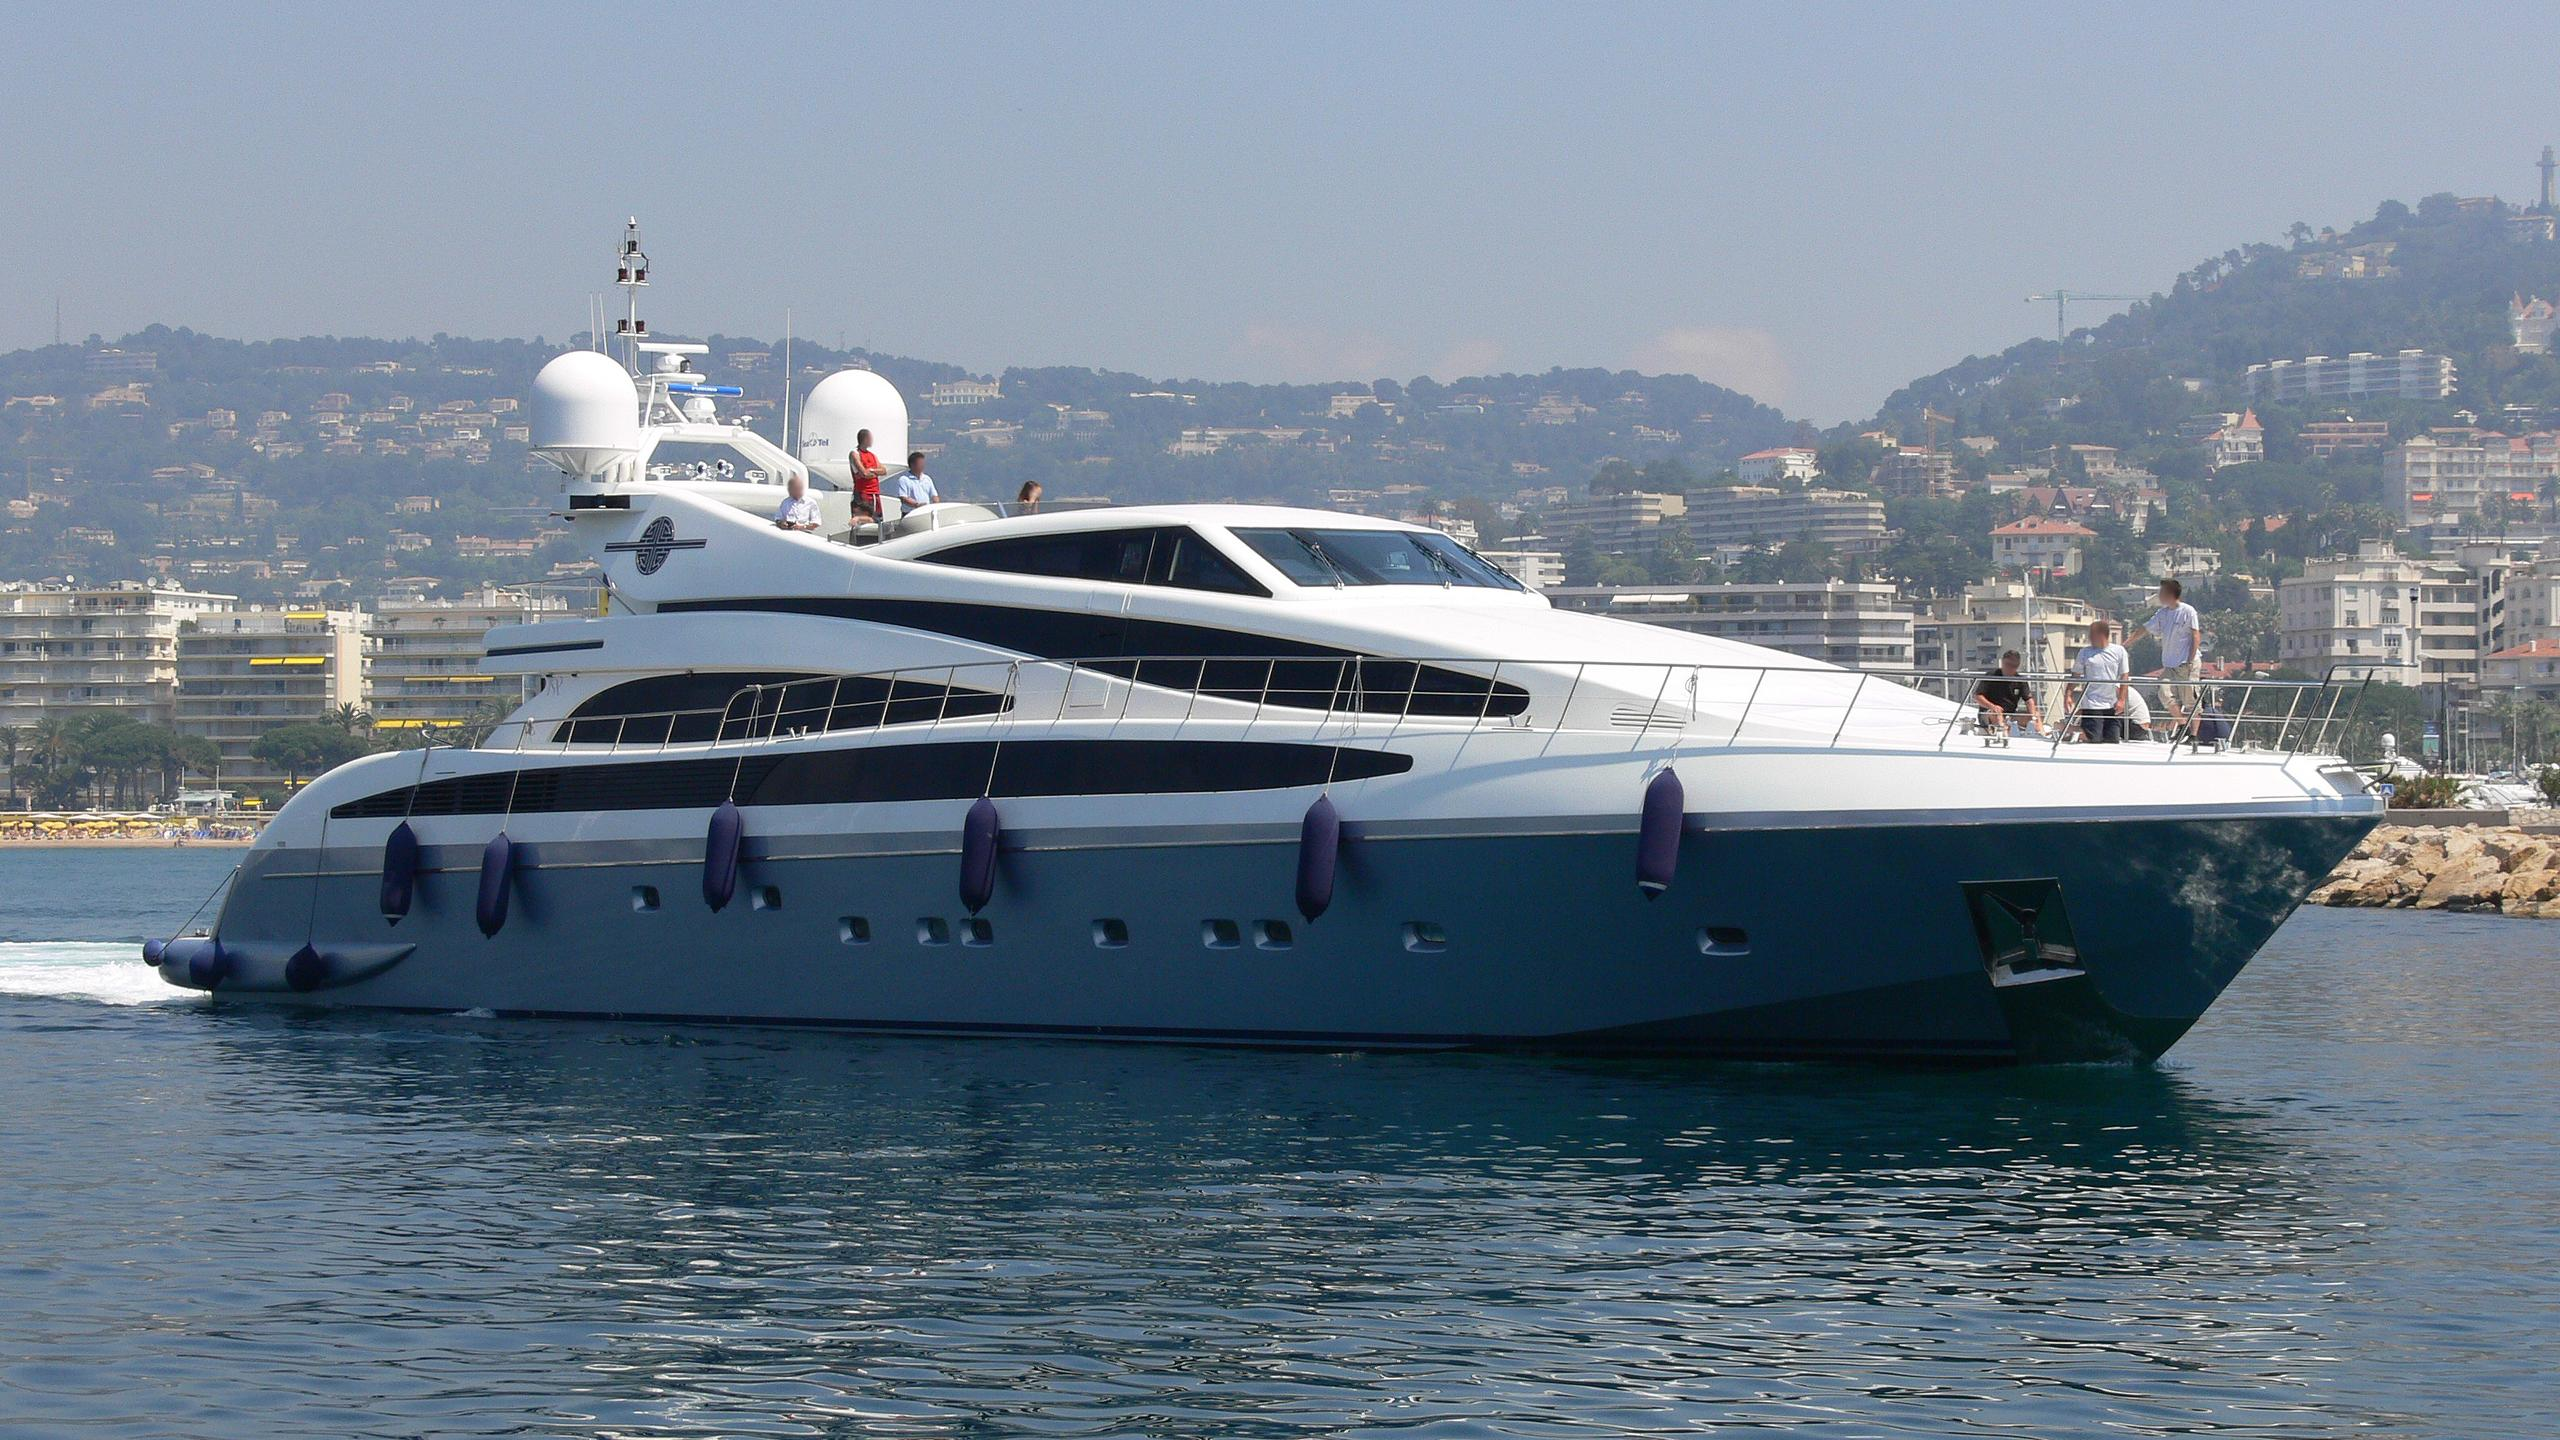 mj-taknm-yacht-exterior